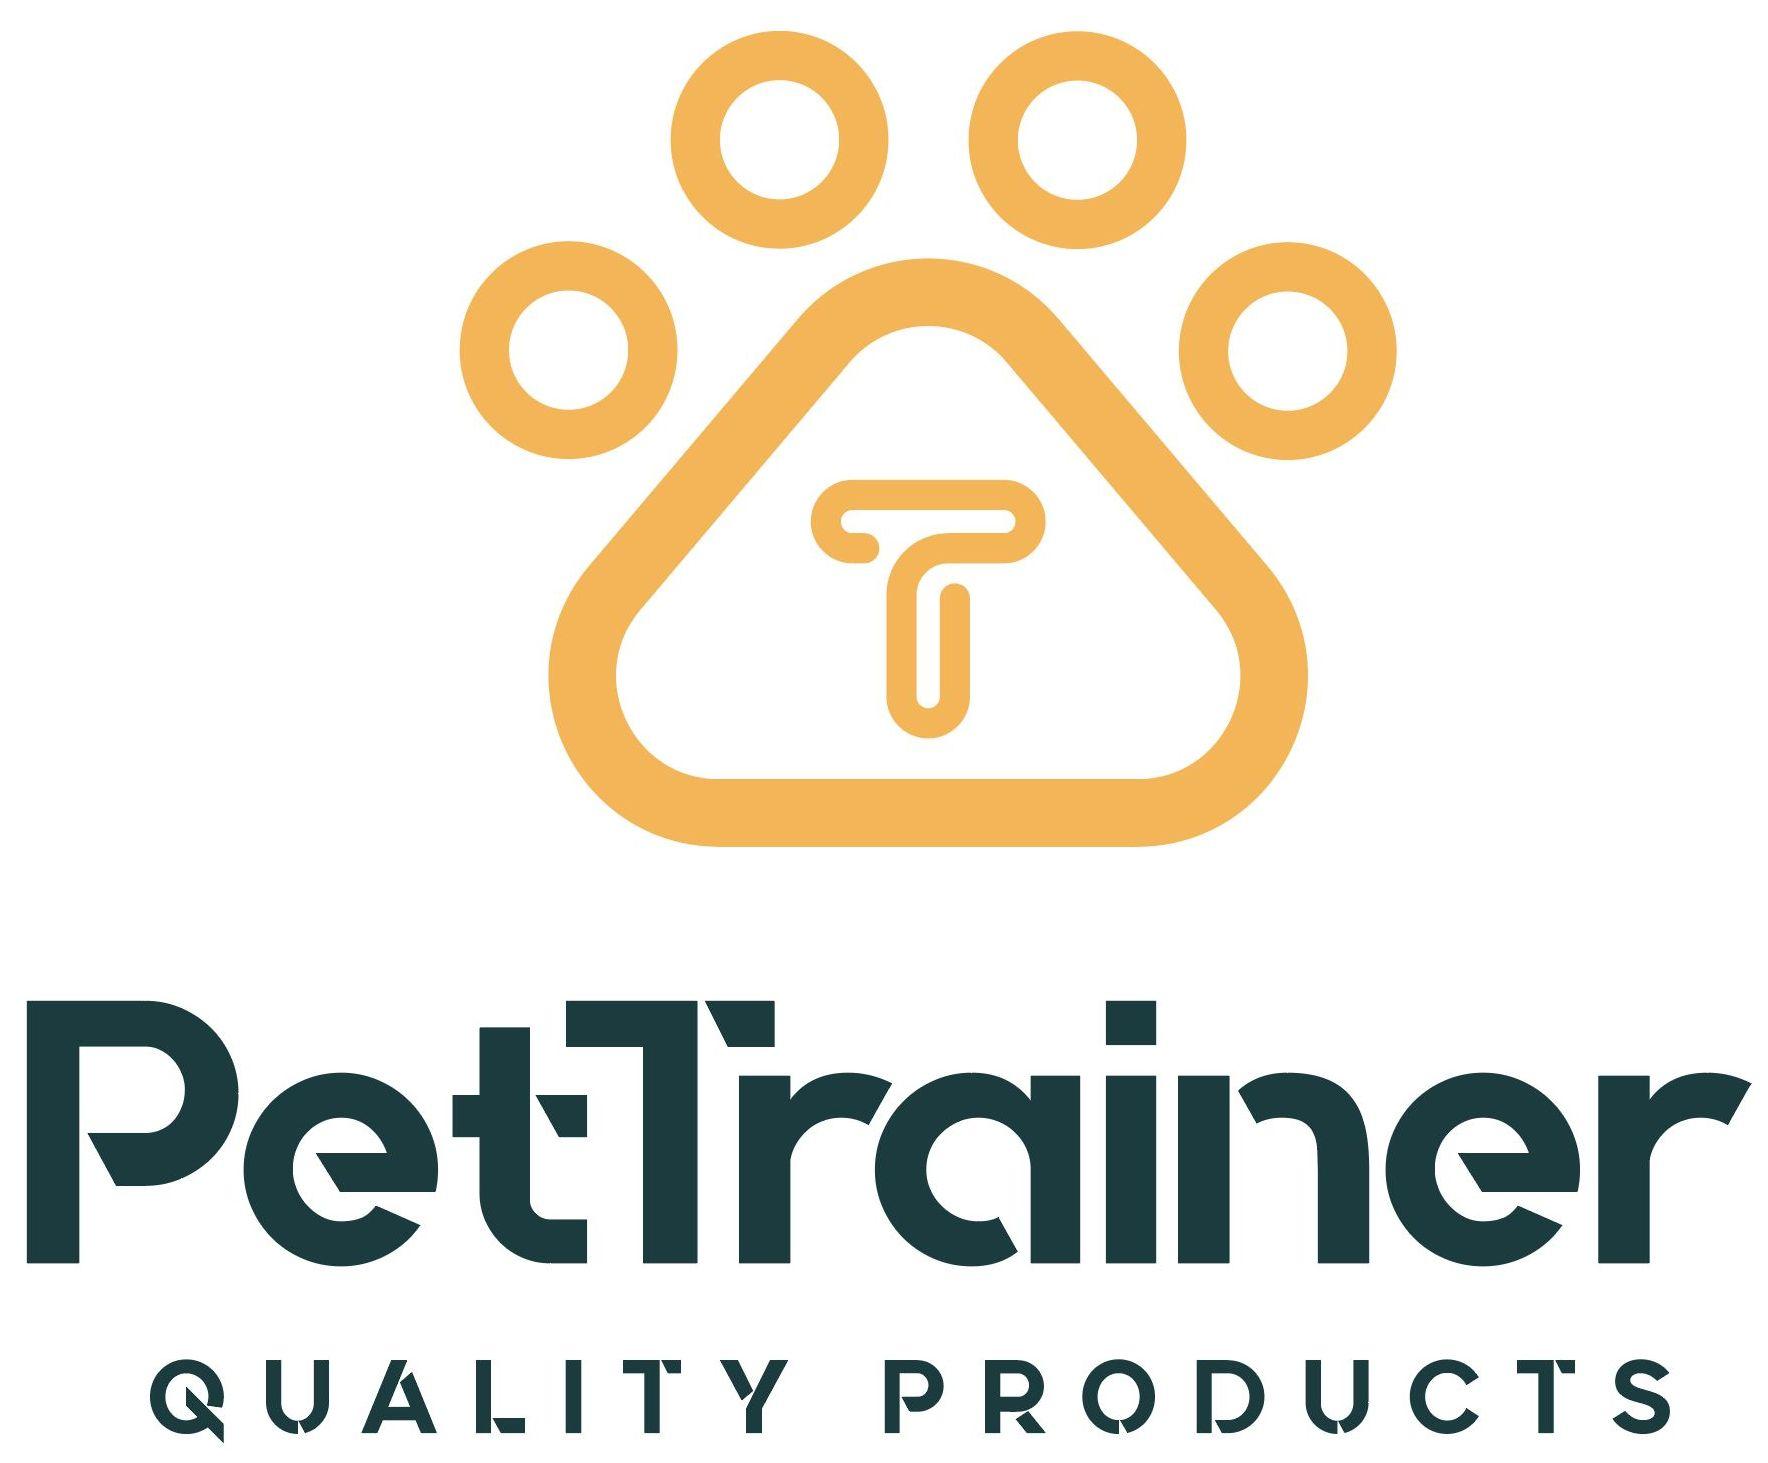 Wort-/Bildmarke: PetTrainer QUALITY PRODUCTS